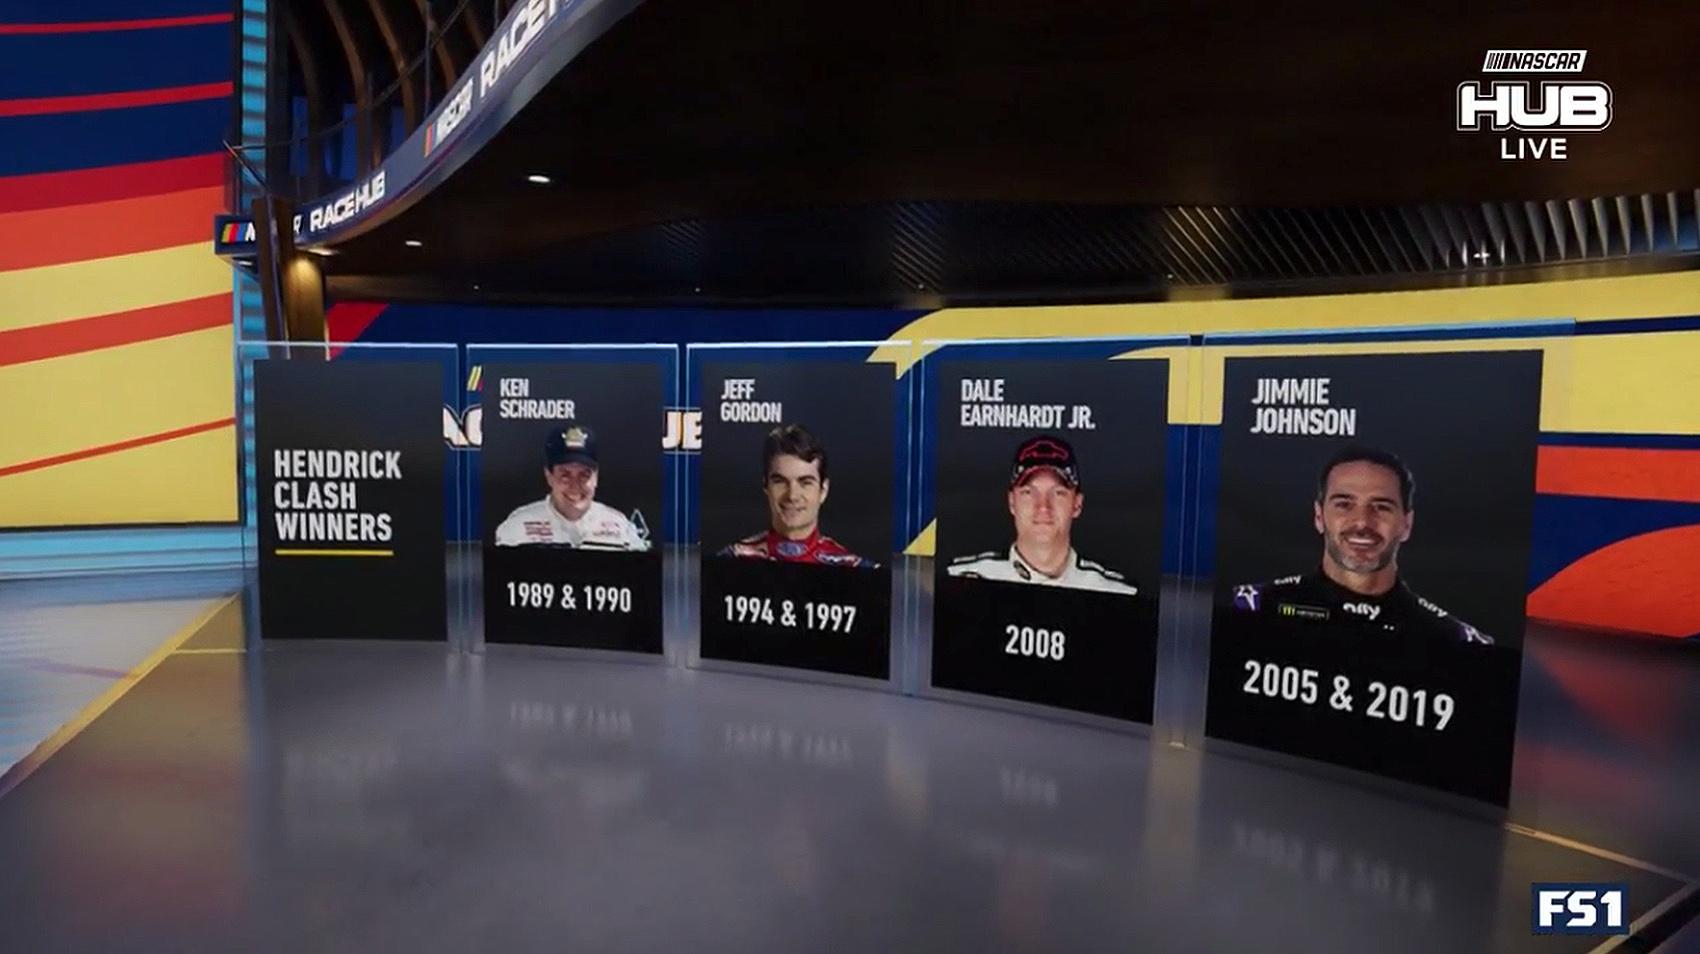 NCS_NASCAR-Fox-2019-Broadcast-Design_025